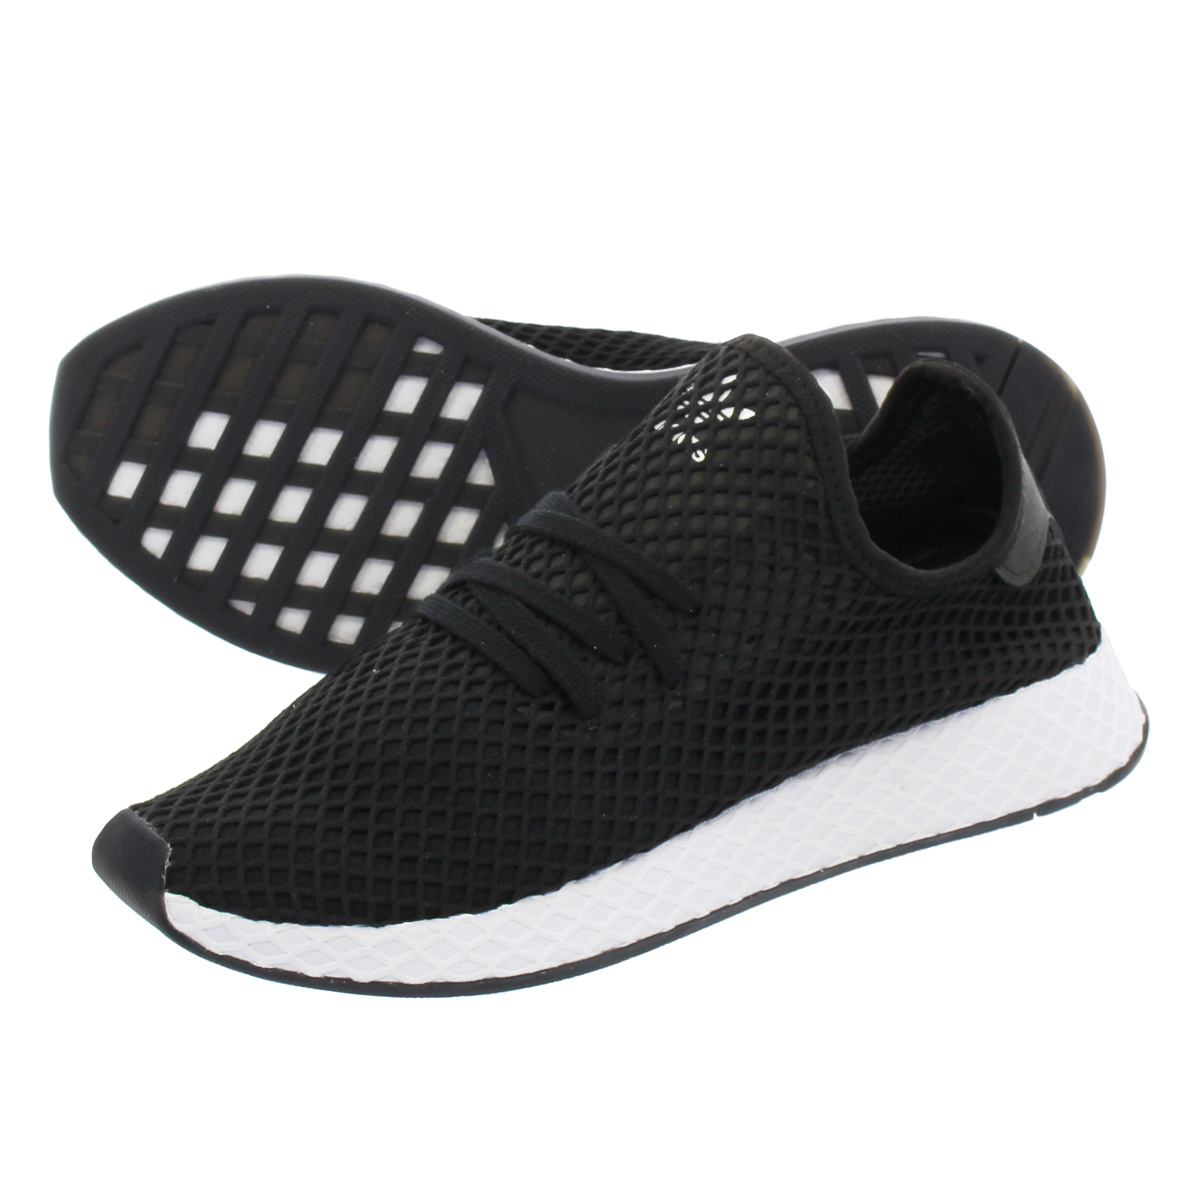 adidas DEERUPT RUNNER KICKS LAB. アディダス ディーラプト ランナー キックスラボ 【KICKS LAB. EXCLUSIVE】 CORE BLACK/CORE BLACK/RUNNING WHITE